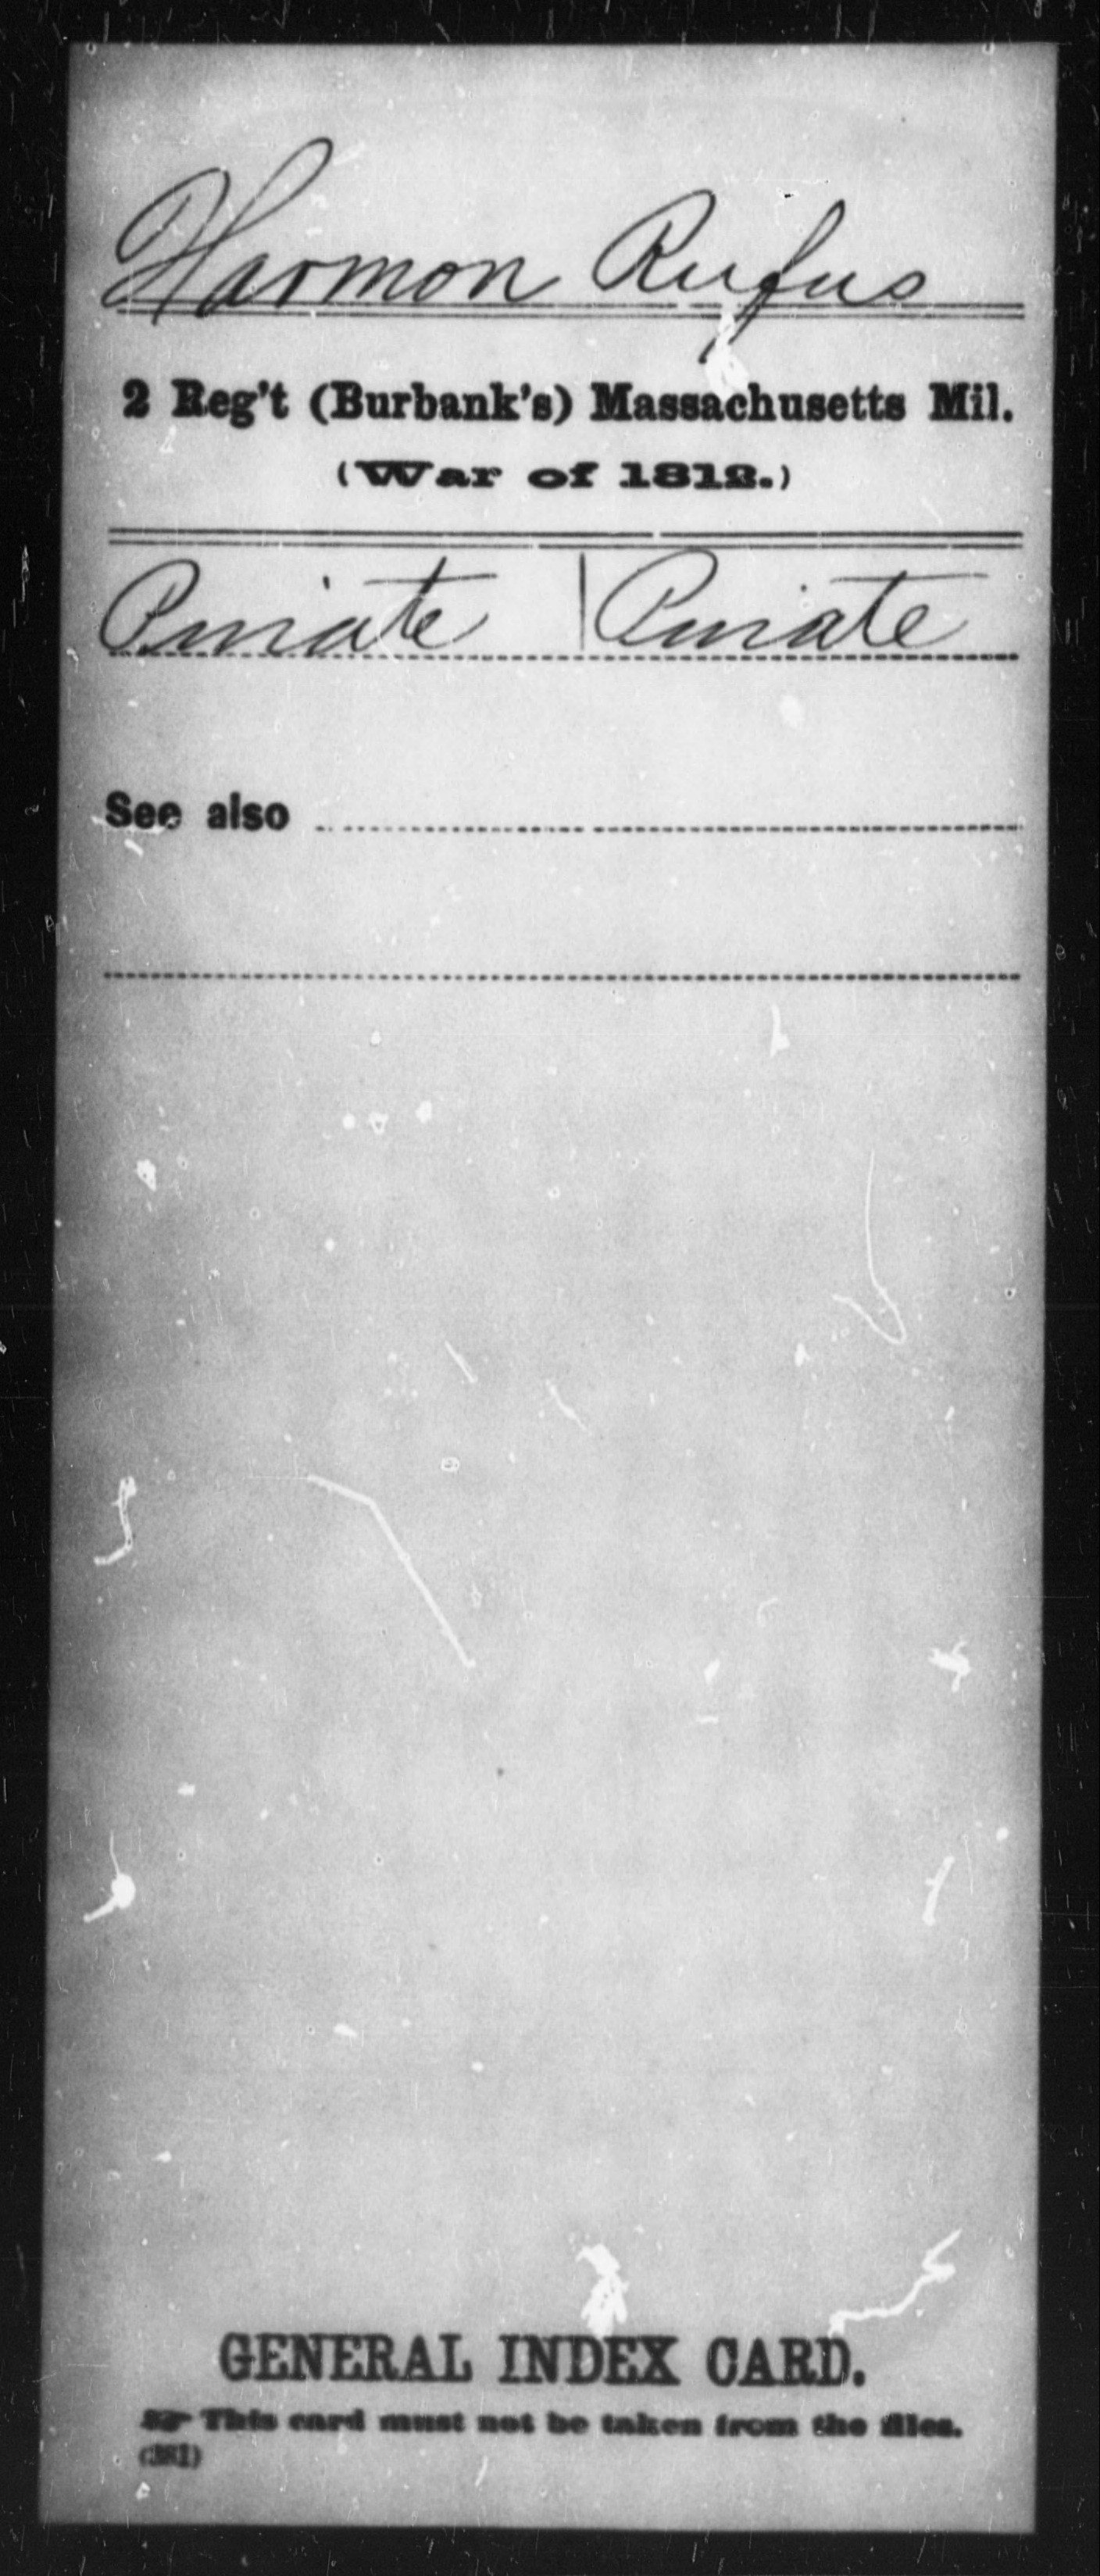 Harmon, Rufus - State: Massachusetts - Regiment: 2 (Burbank's) Massachusetts Mil